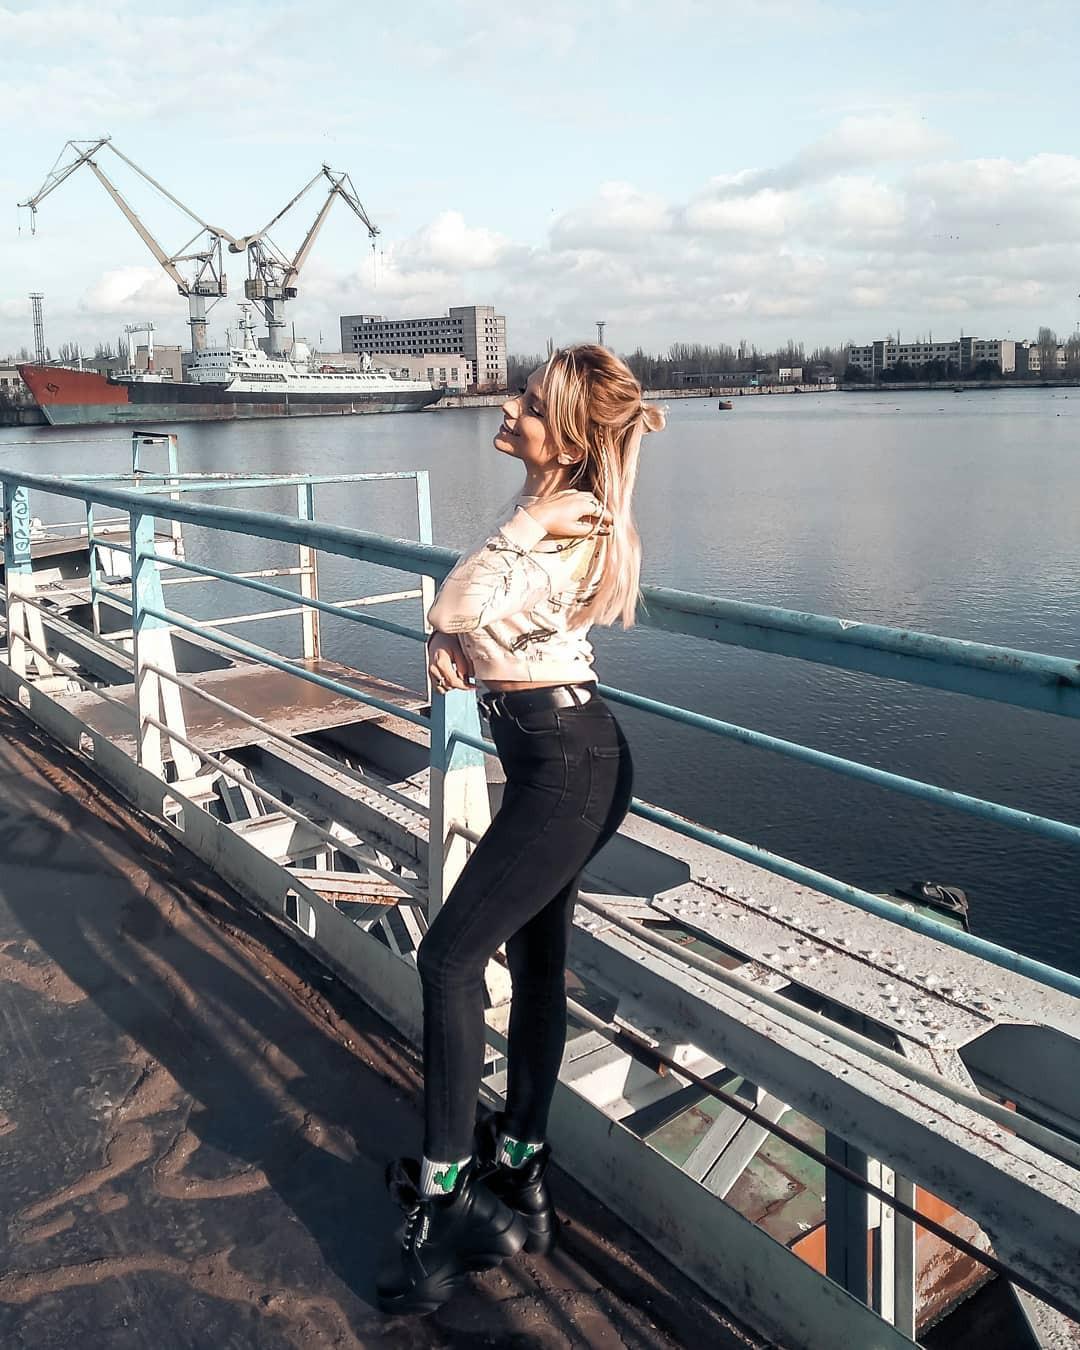 Aleksandra Glance trousers, leggings, jeans outfits for women